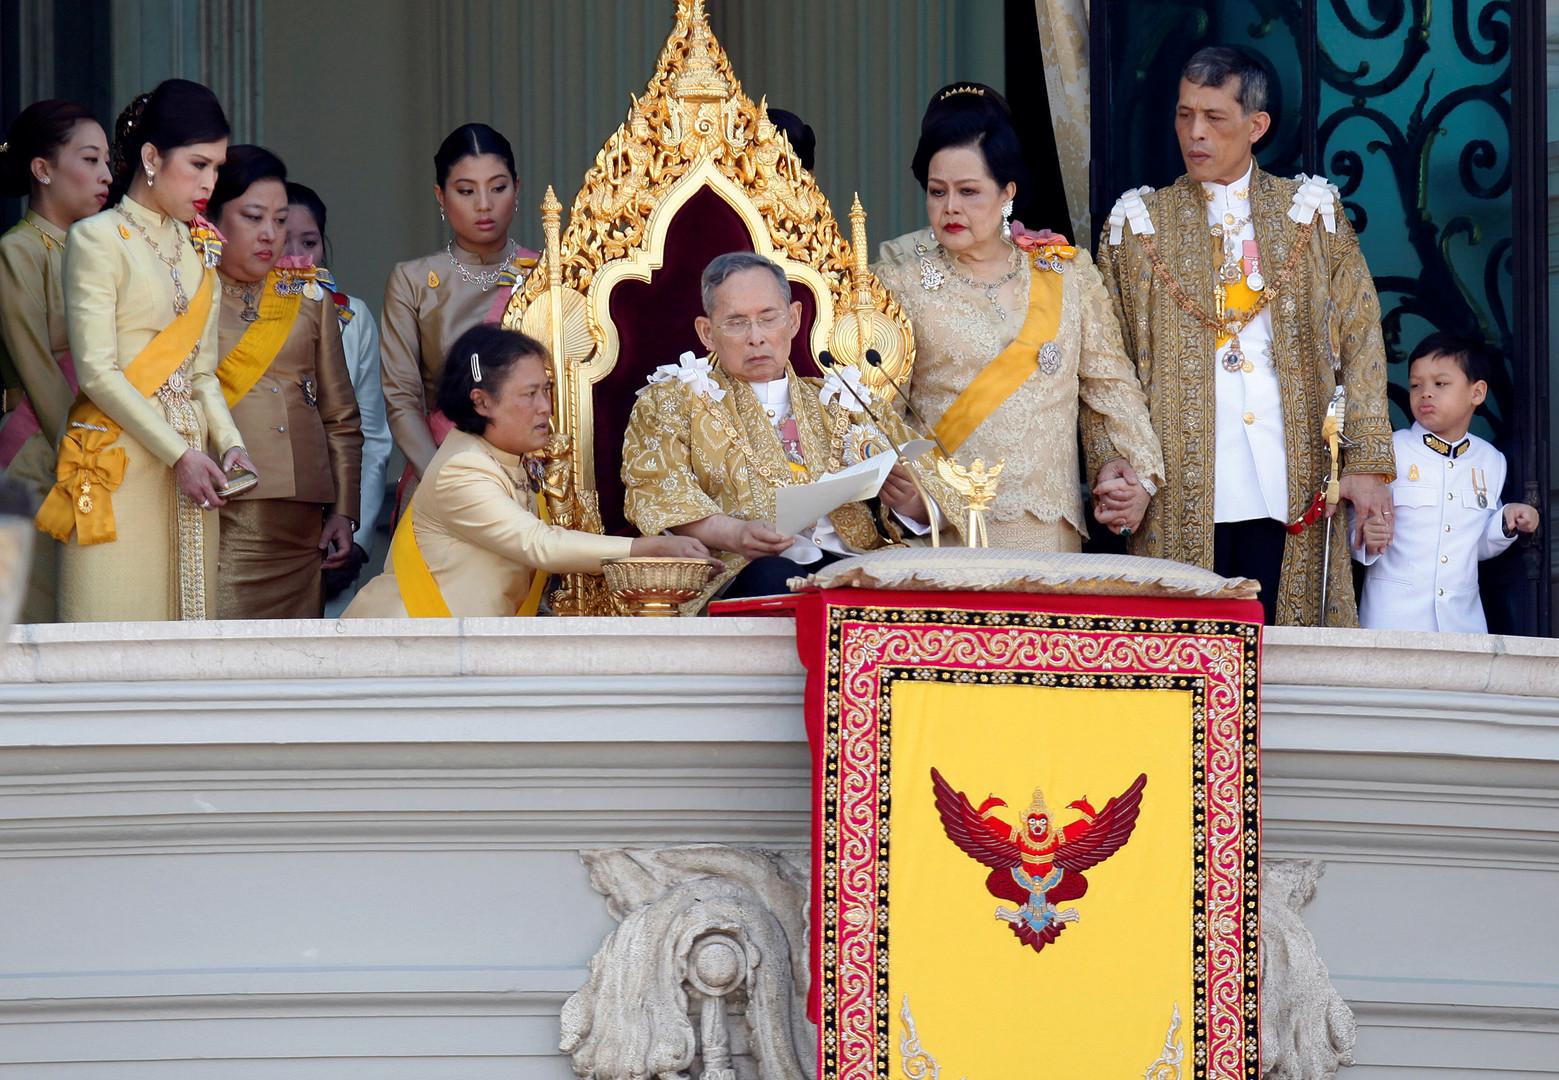 Принцесса Маха Чакри Сириндхорн помогает королю Таиланда Пхумипону Адульядету.